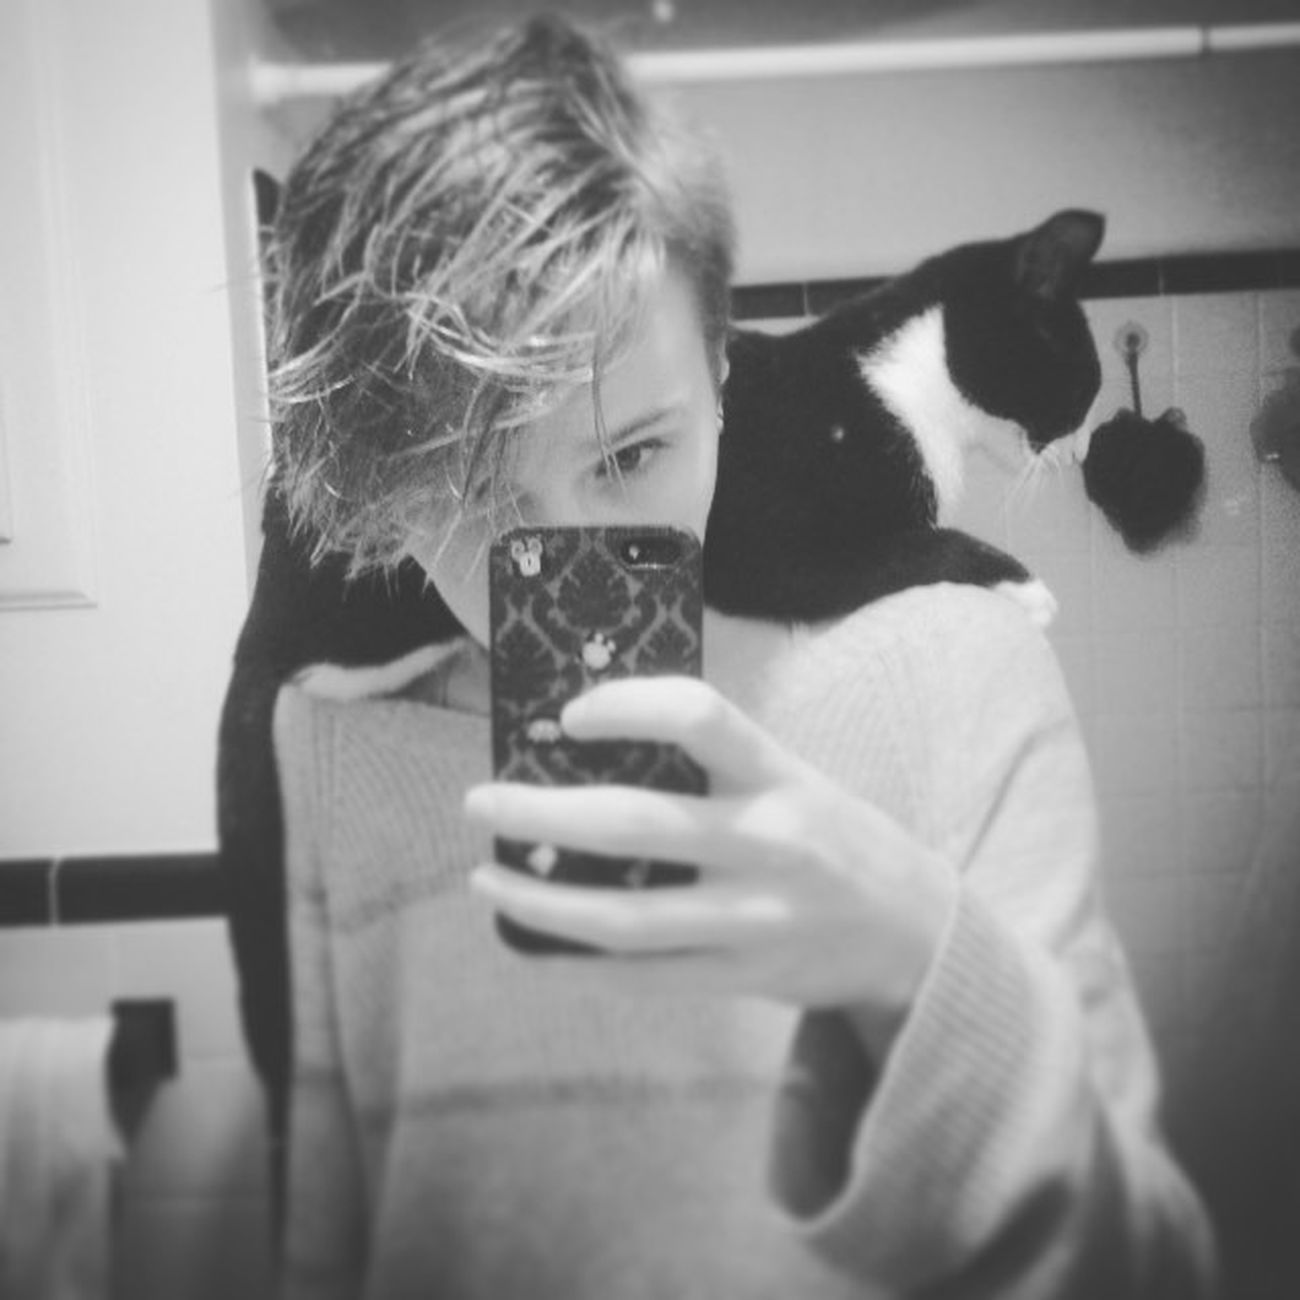 Won't you be my sidekick? Sidekick Superhero Cat Kitty Mysidekick Wontyoubemysidekick Ilovecat Ilovemycat Catsofinstagram Petsofinstagram Blackandwhite Monochrome Cats Alywashere